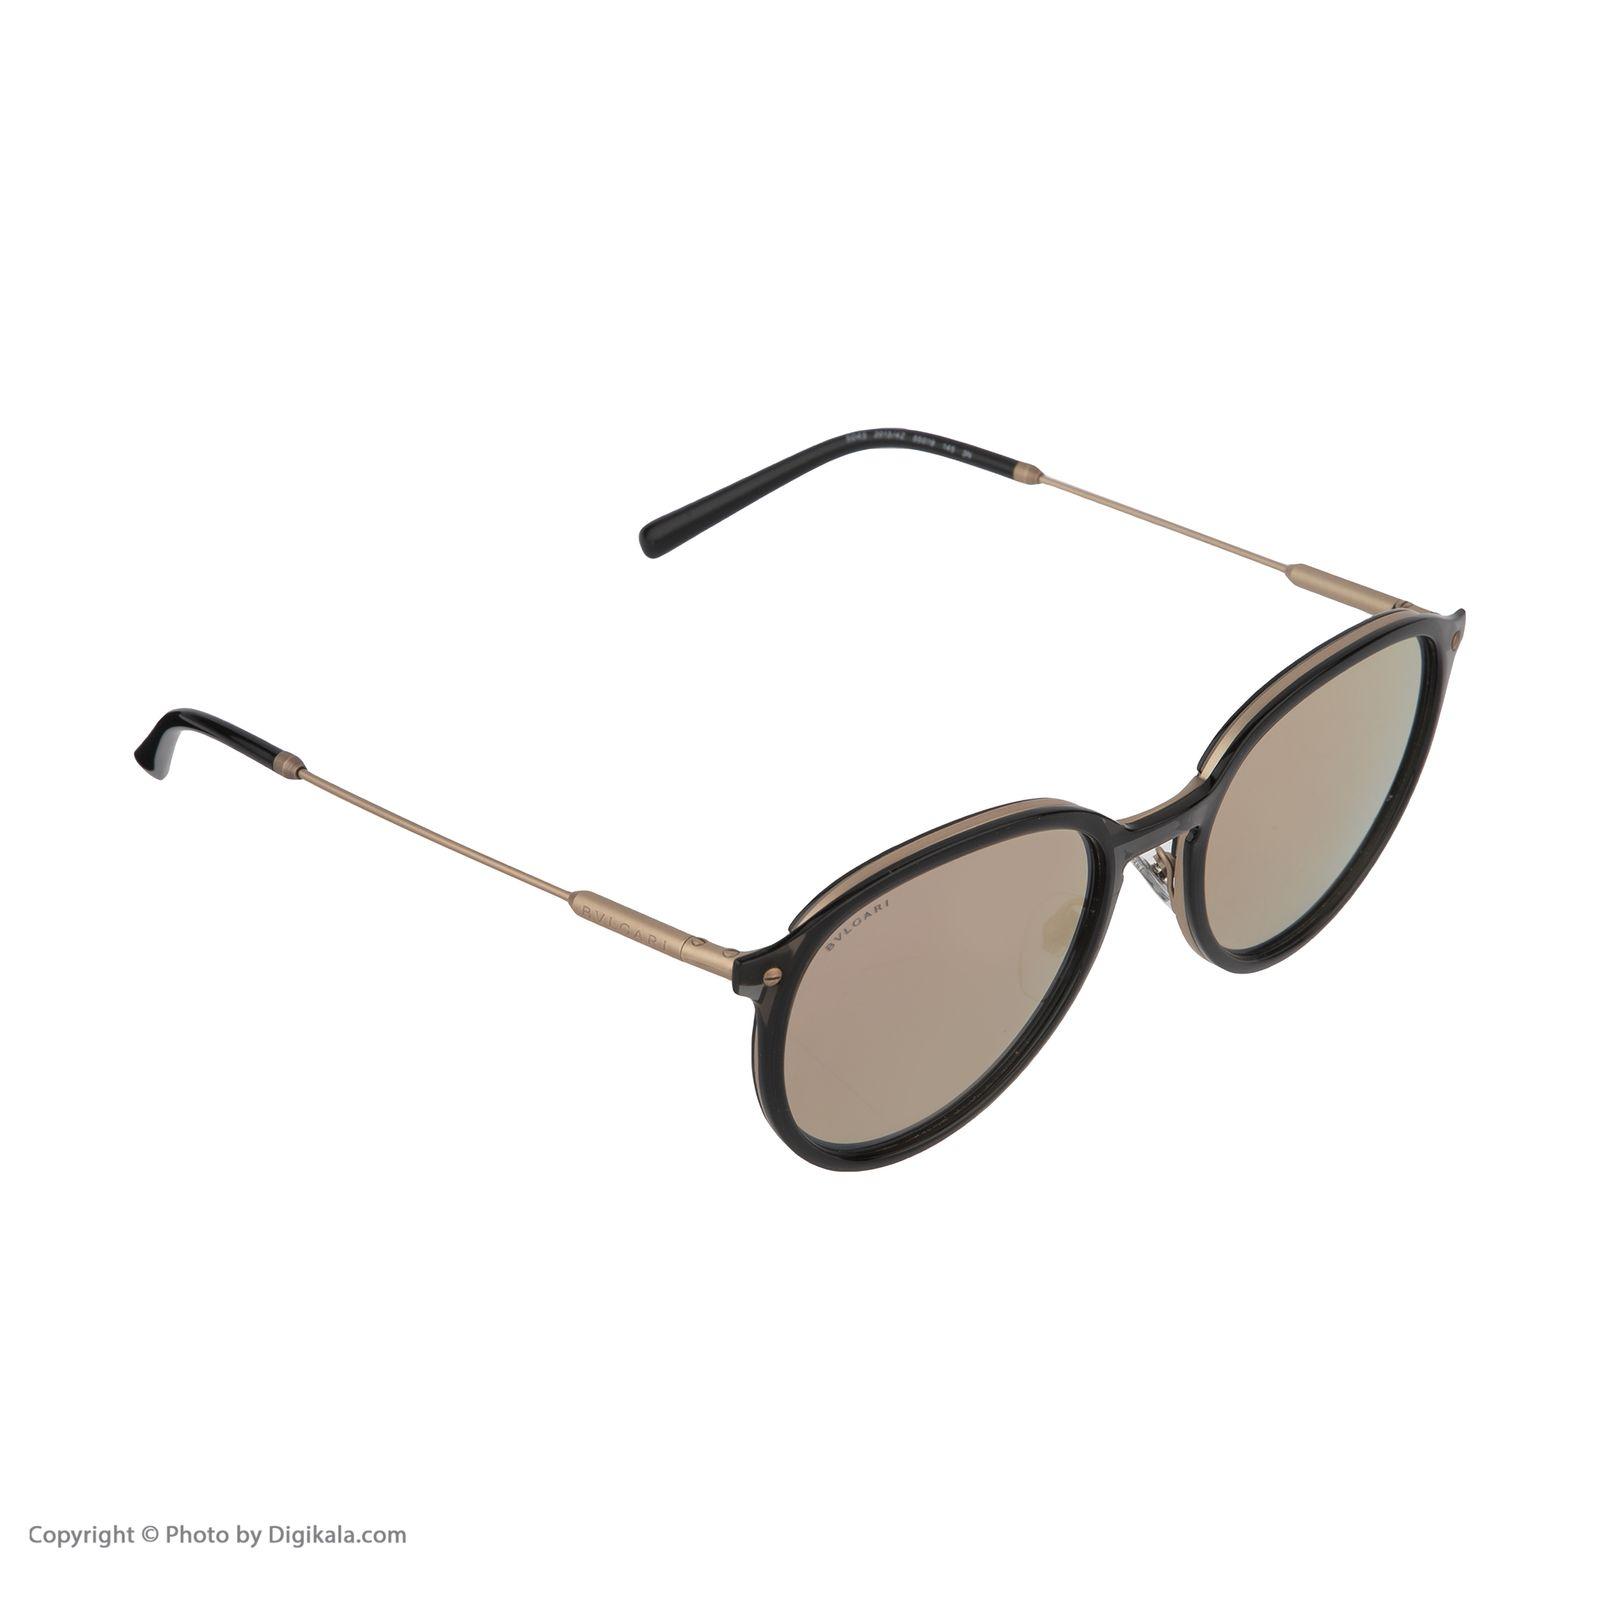 عینک آفتابی زنانه بولگاری مدل BV5045S 20134Z -  - 5